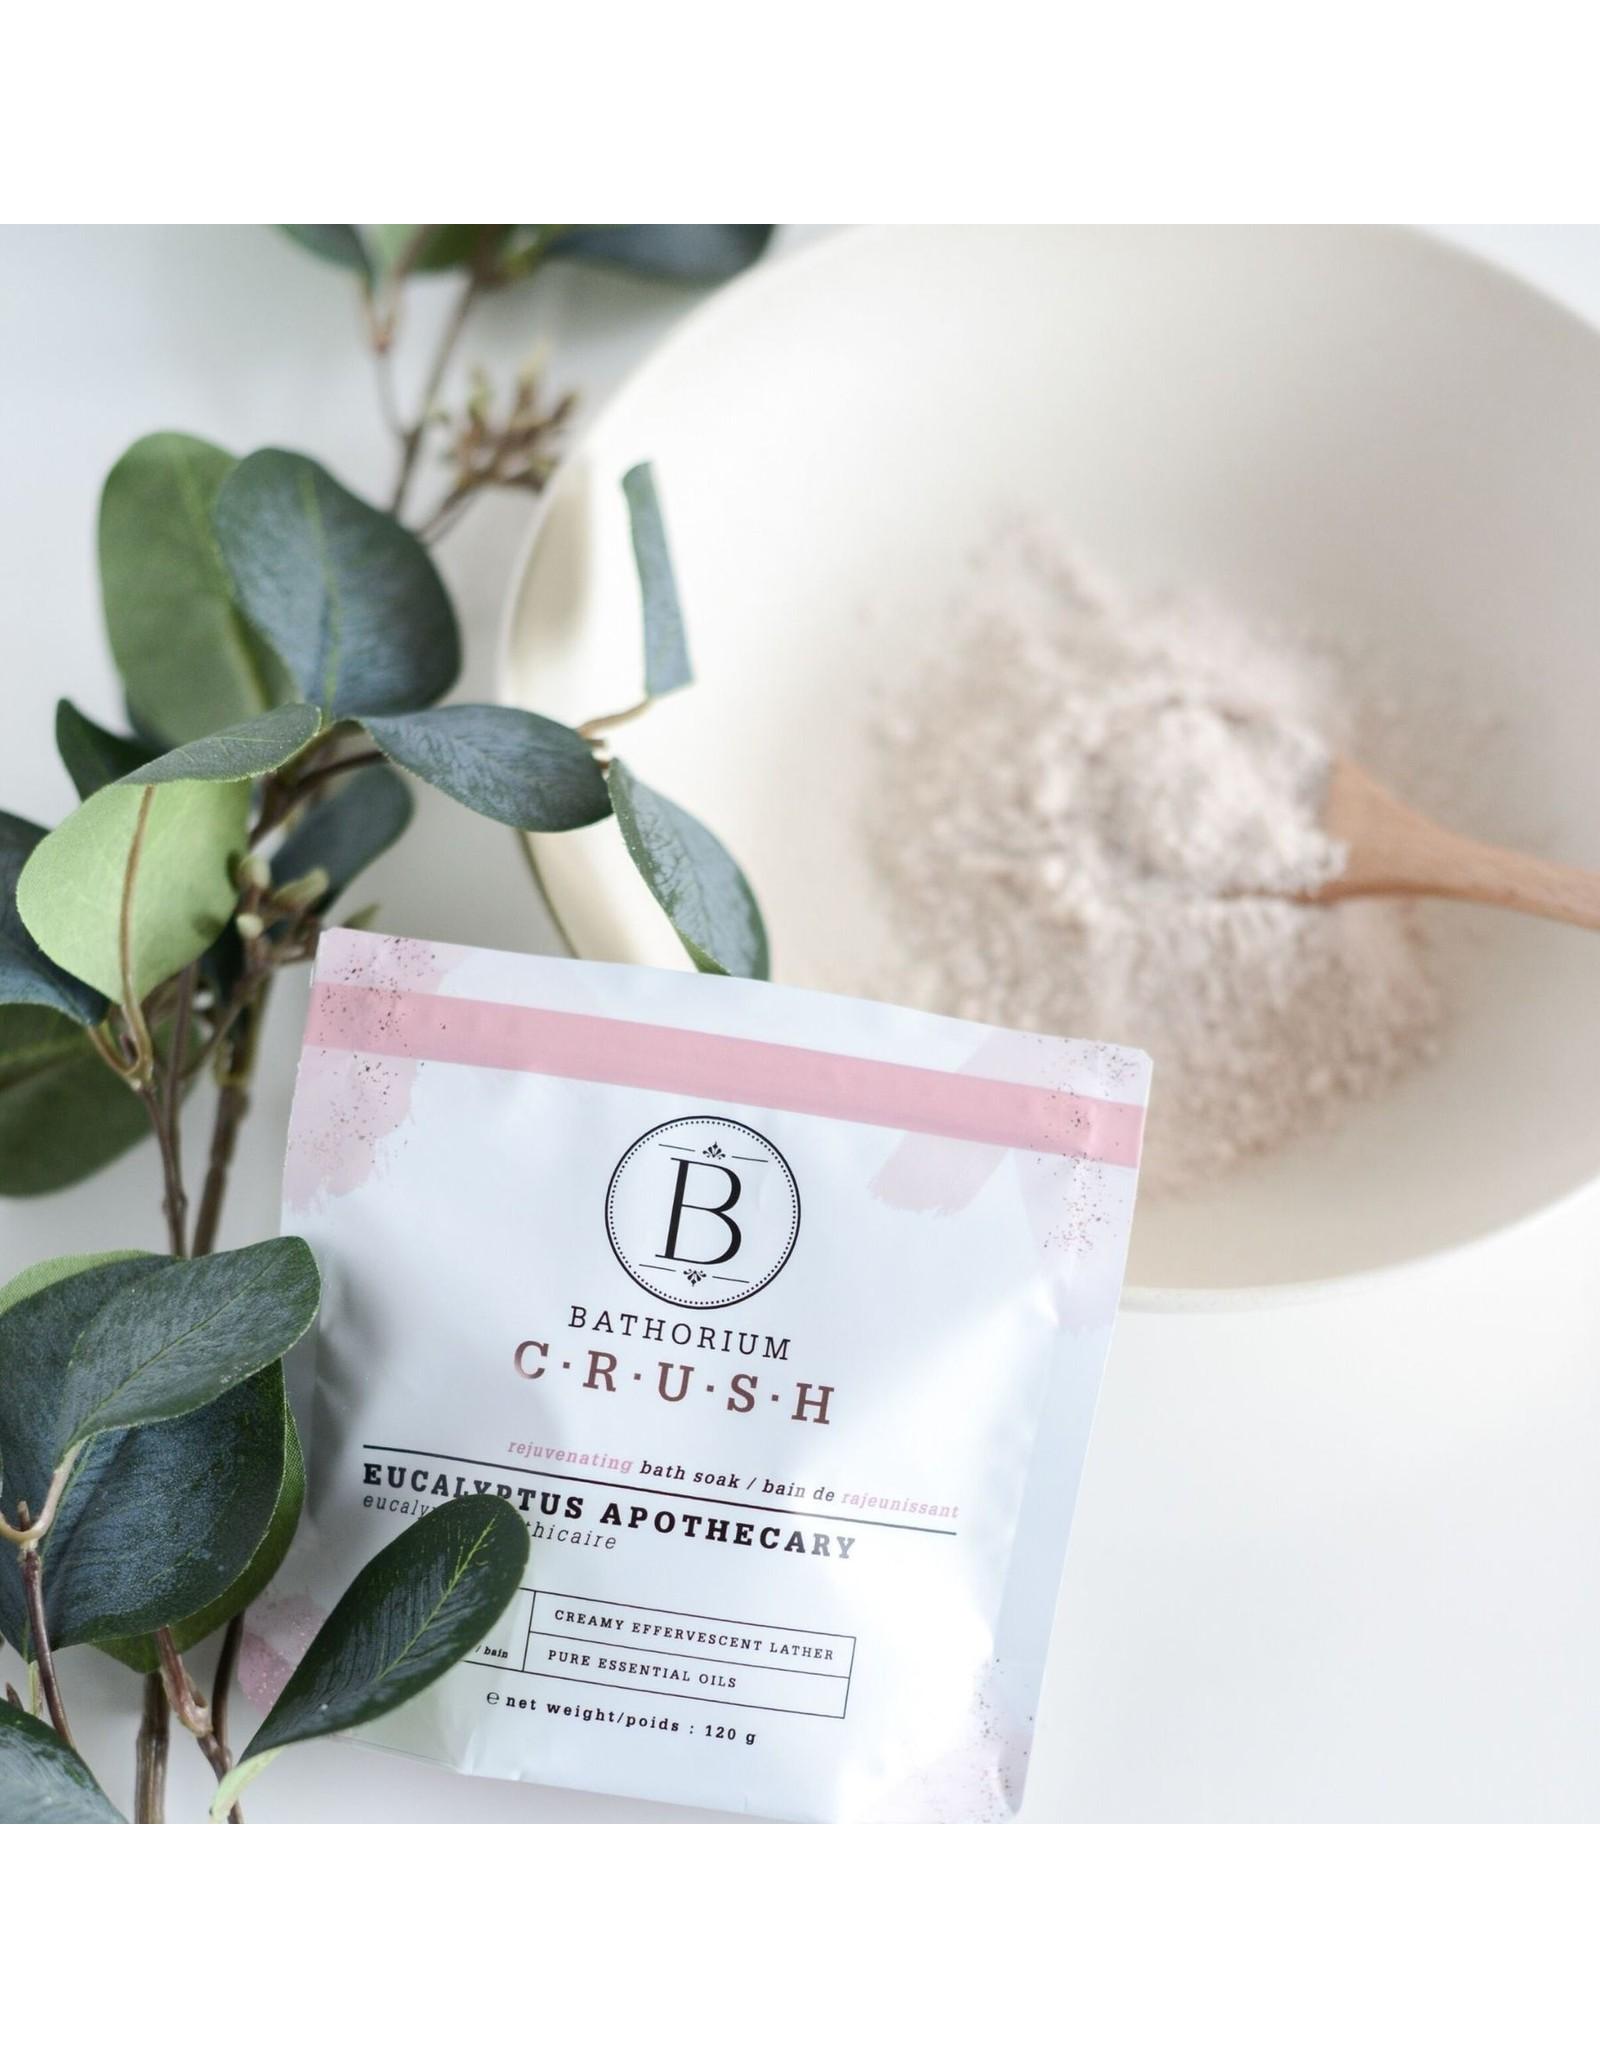 Bathorium - Eucalyptus Apothecary Crush